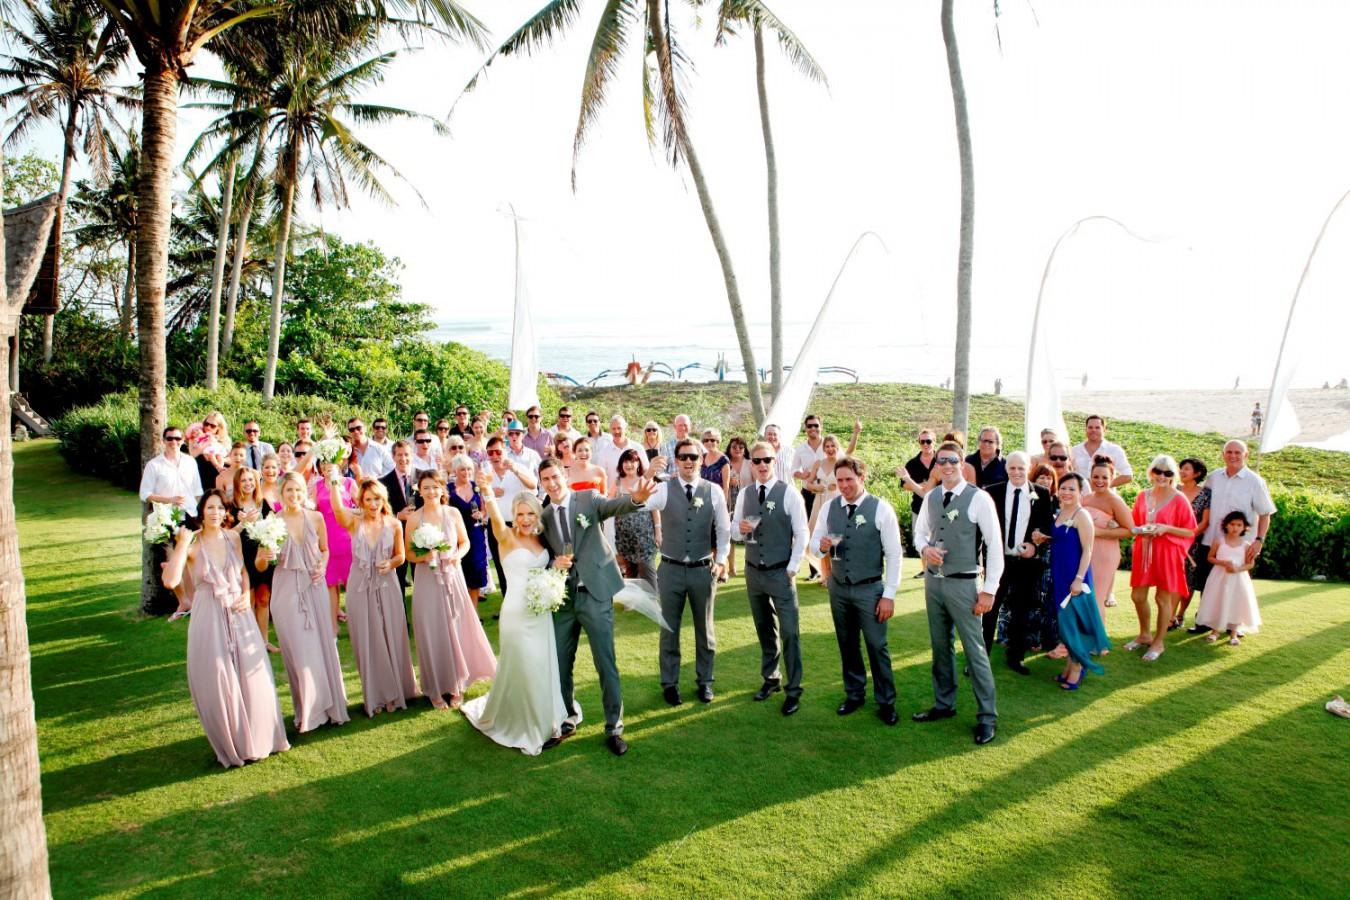 2011.10.16, Megann and Daniel, Ombak Luwung, MJY - Bali Wedding Paradise (21)